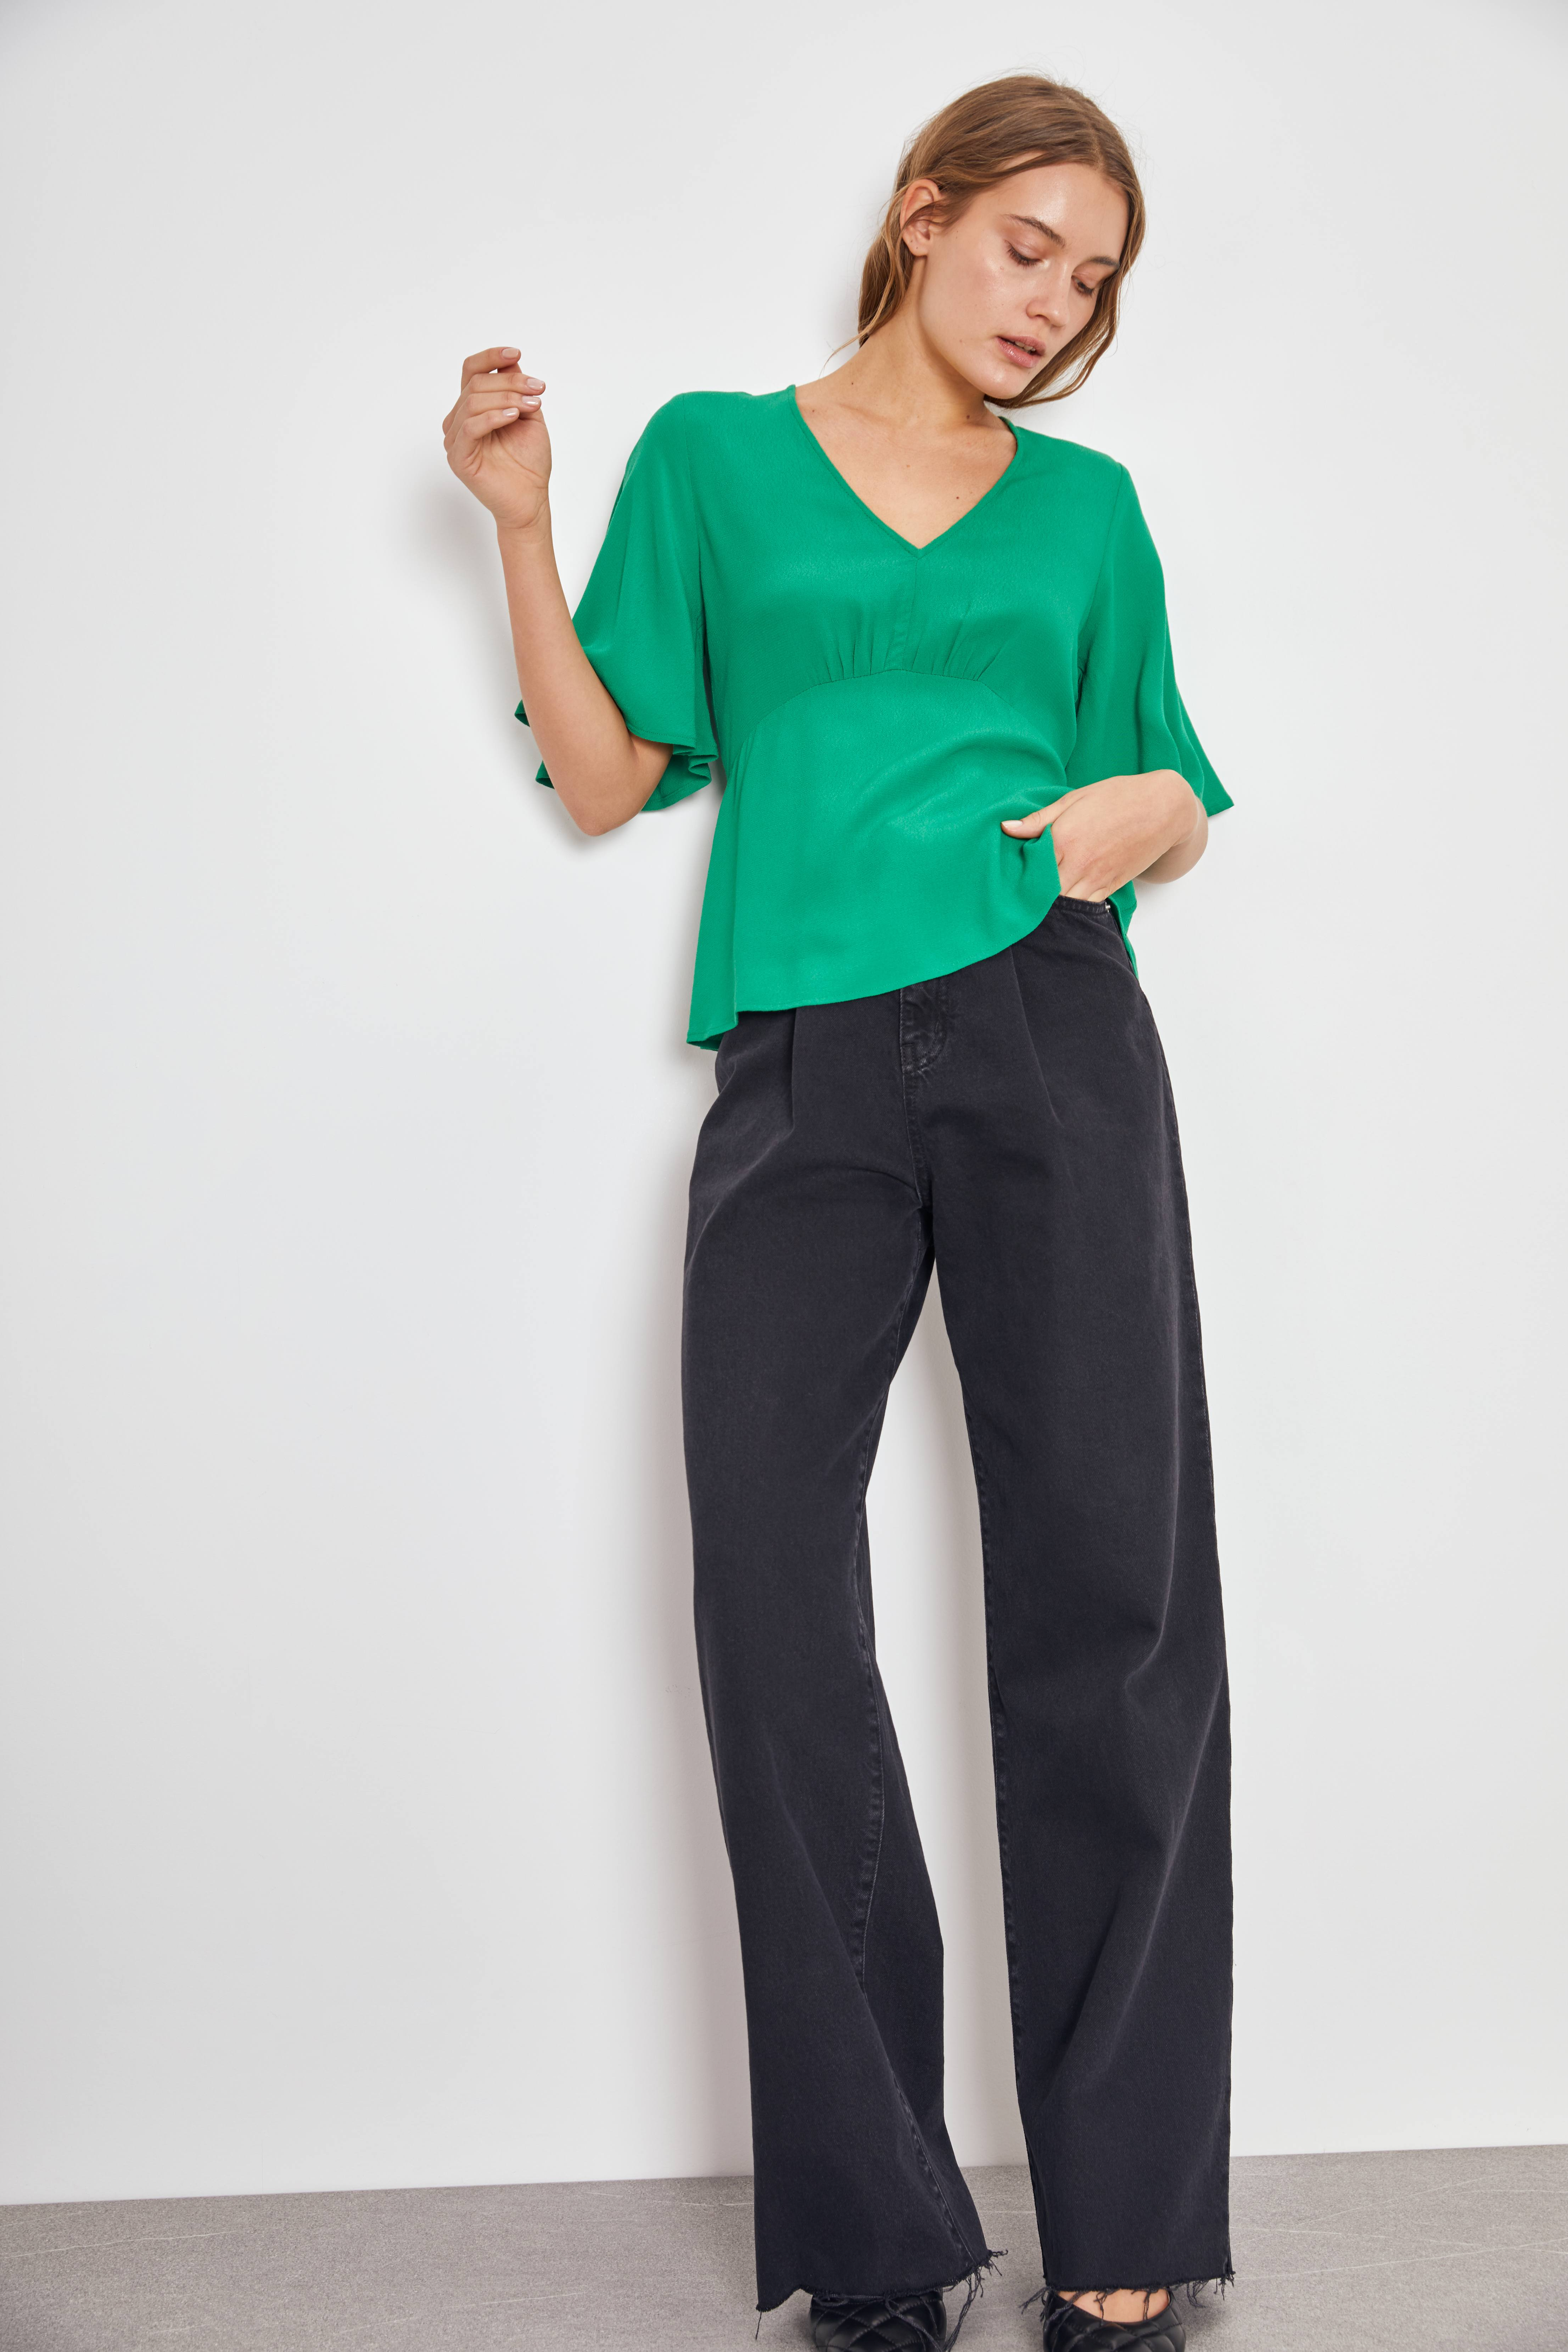 Блузка LIME Блузка с V-образным вырезом блузка lime блузка с эластичной талией